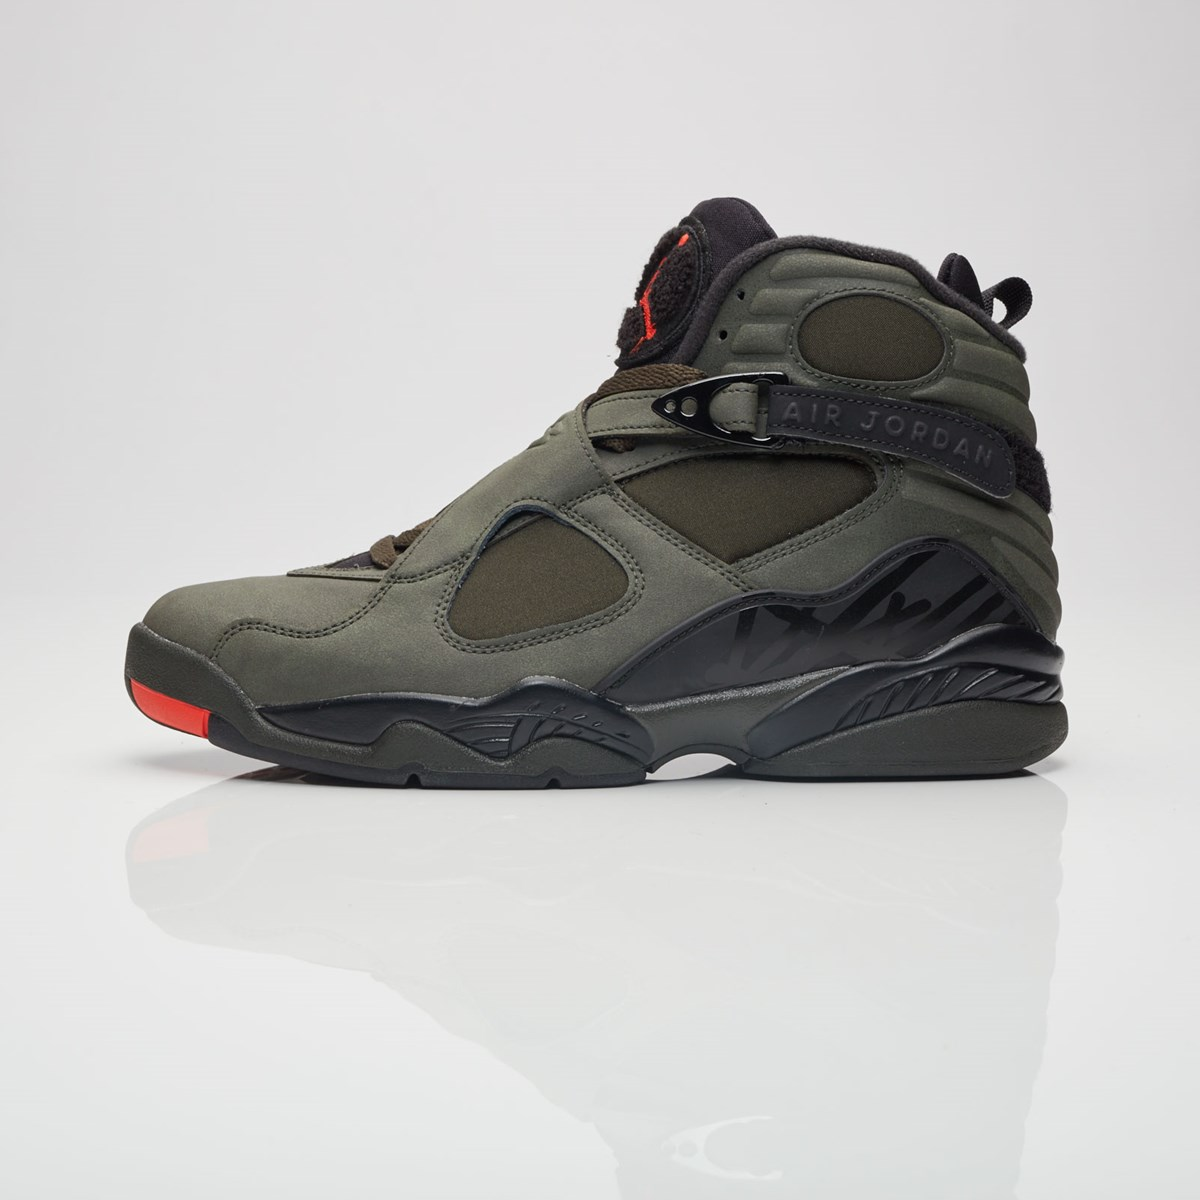 5dfa0c5a6103 Jordan Brand Air Jordan 8 Retro - 305381-305 - Sneakersnstuff ...